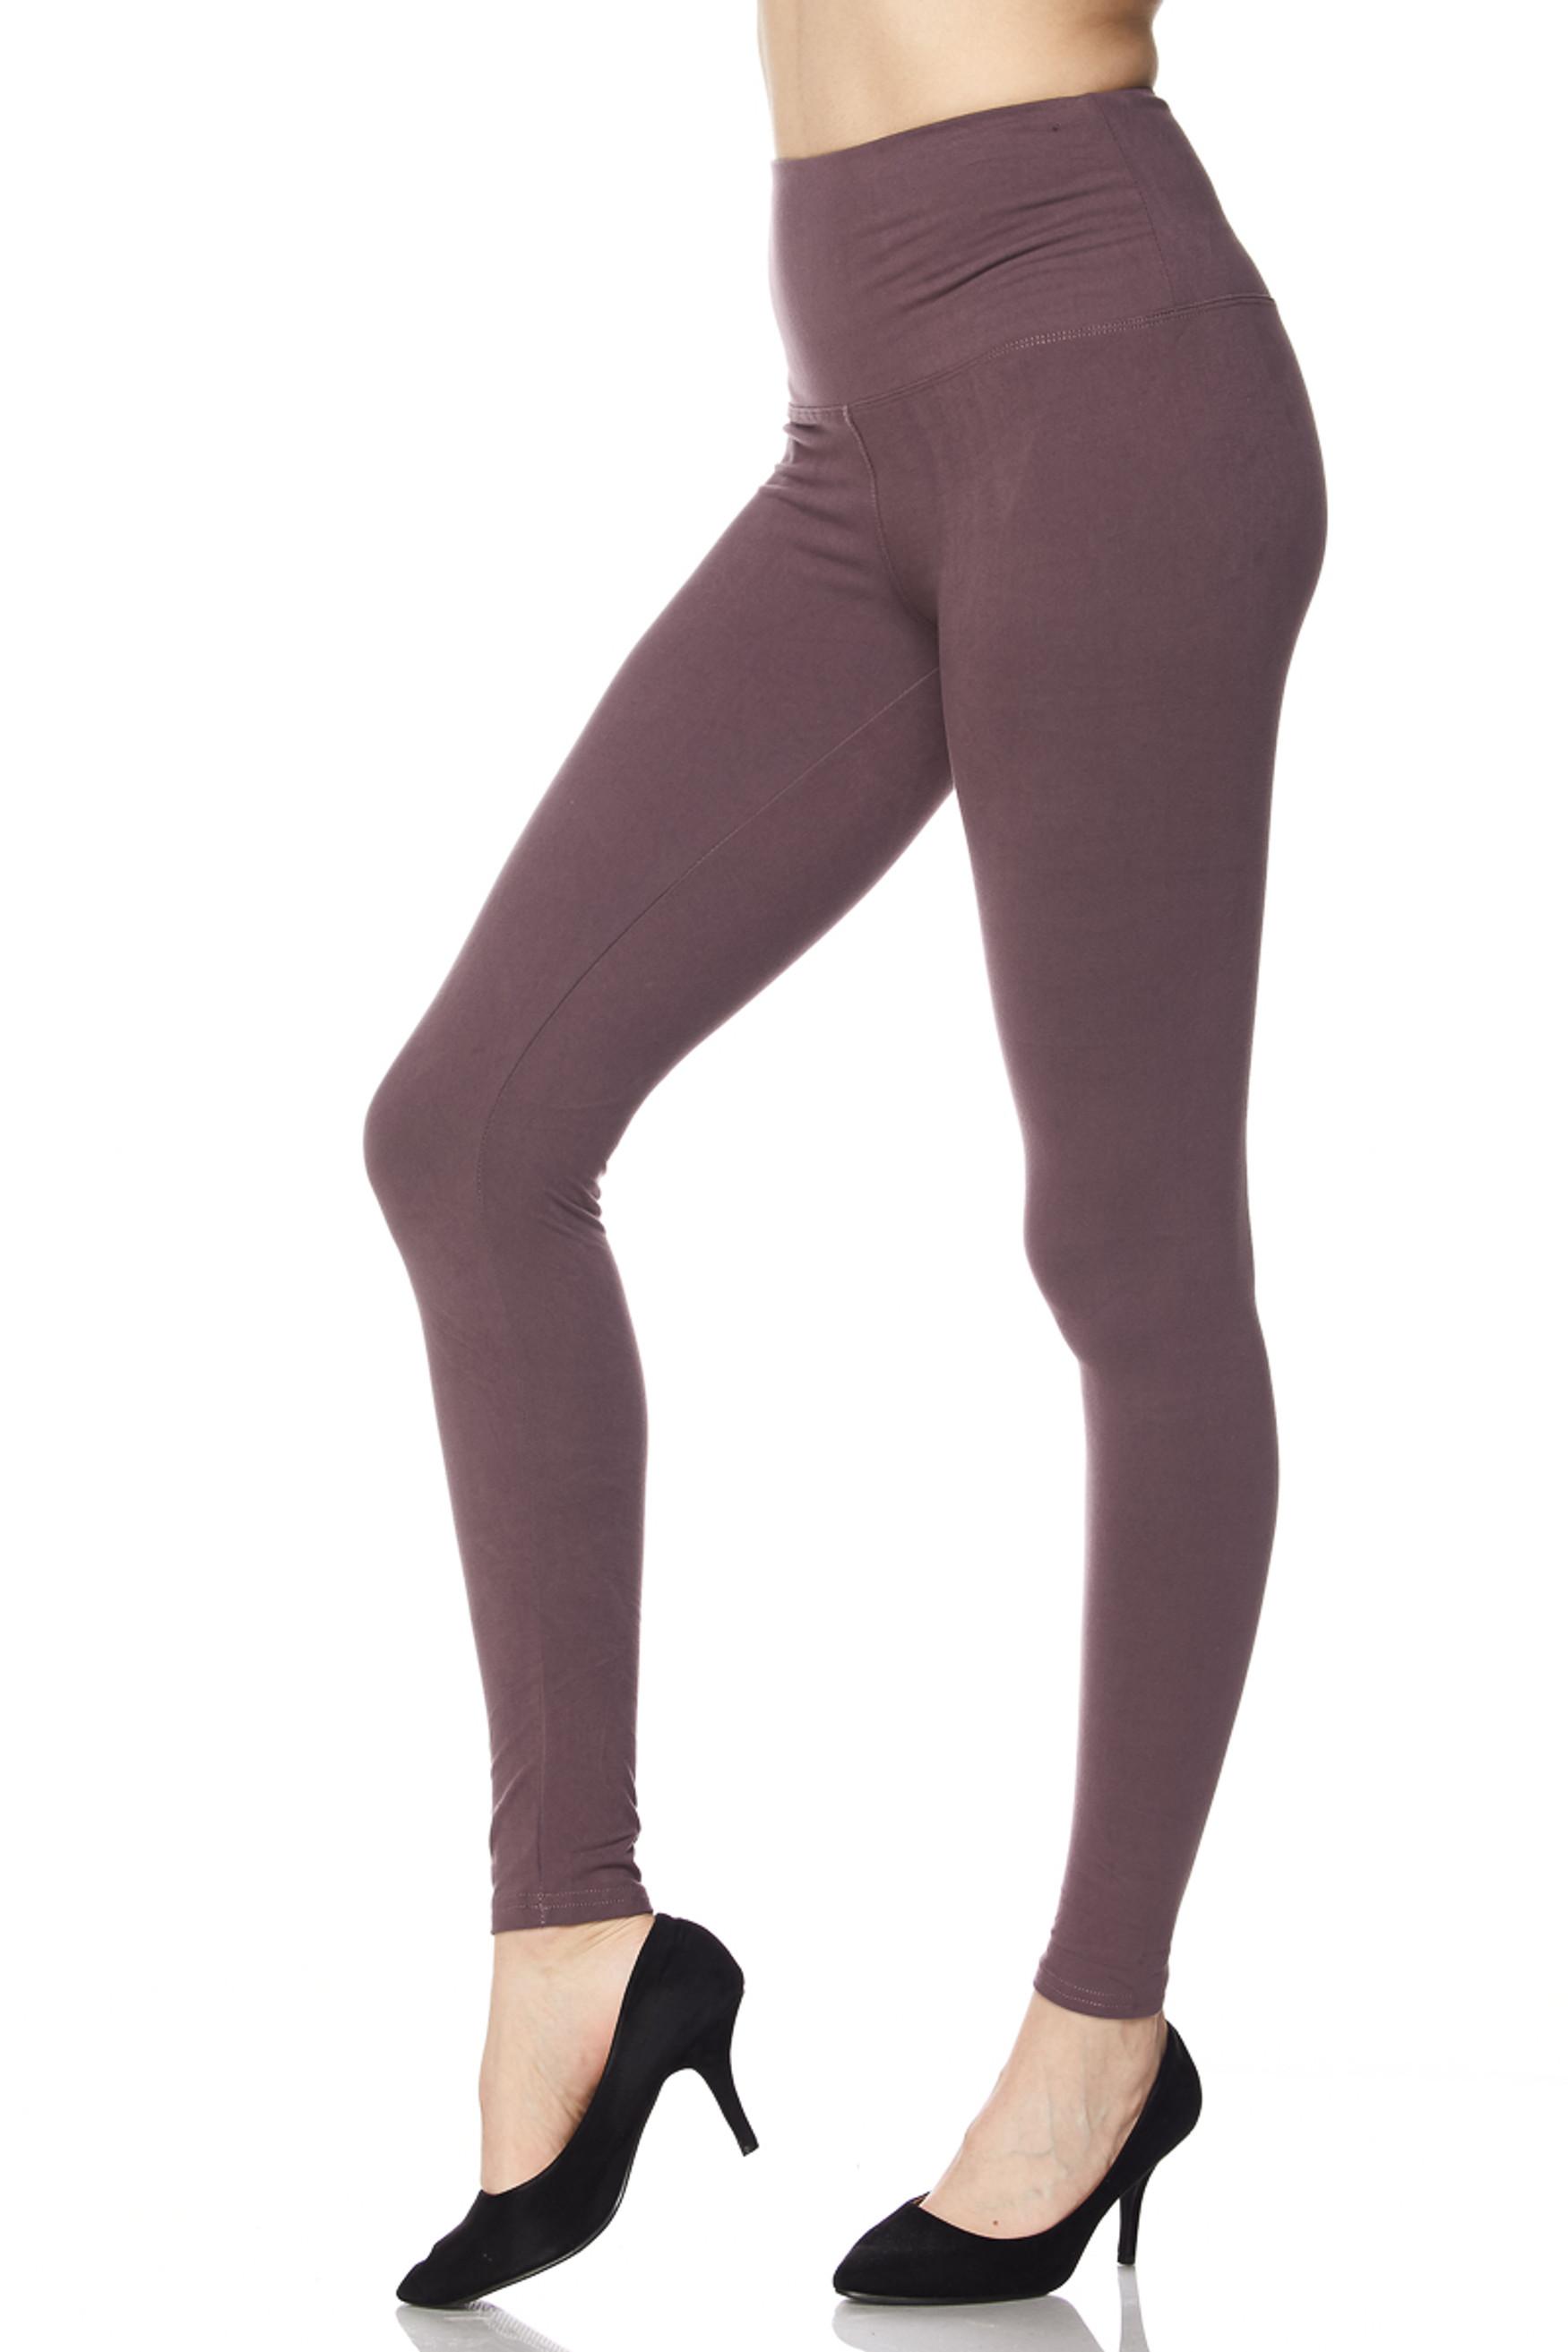 Brushed High Waisted Plus Size Basic Solid Leggings - 5 Inch Band